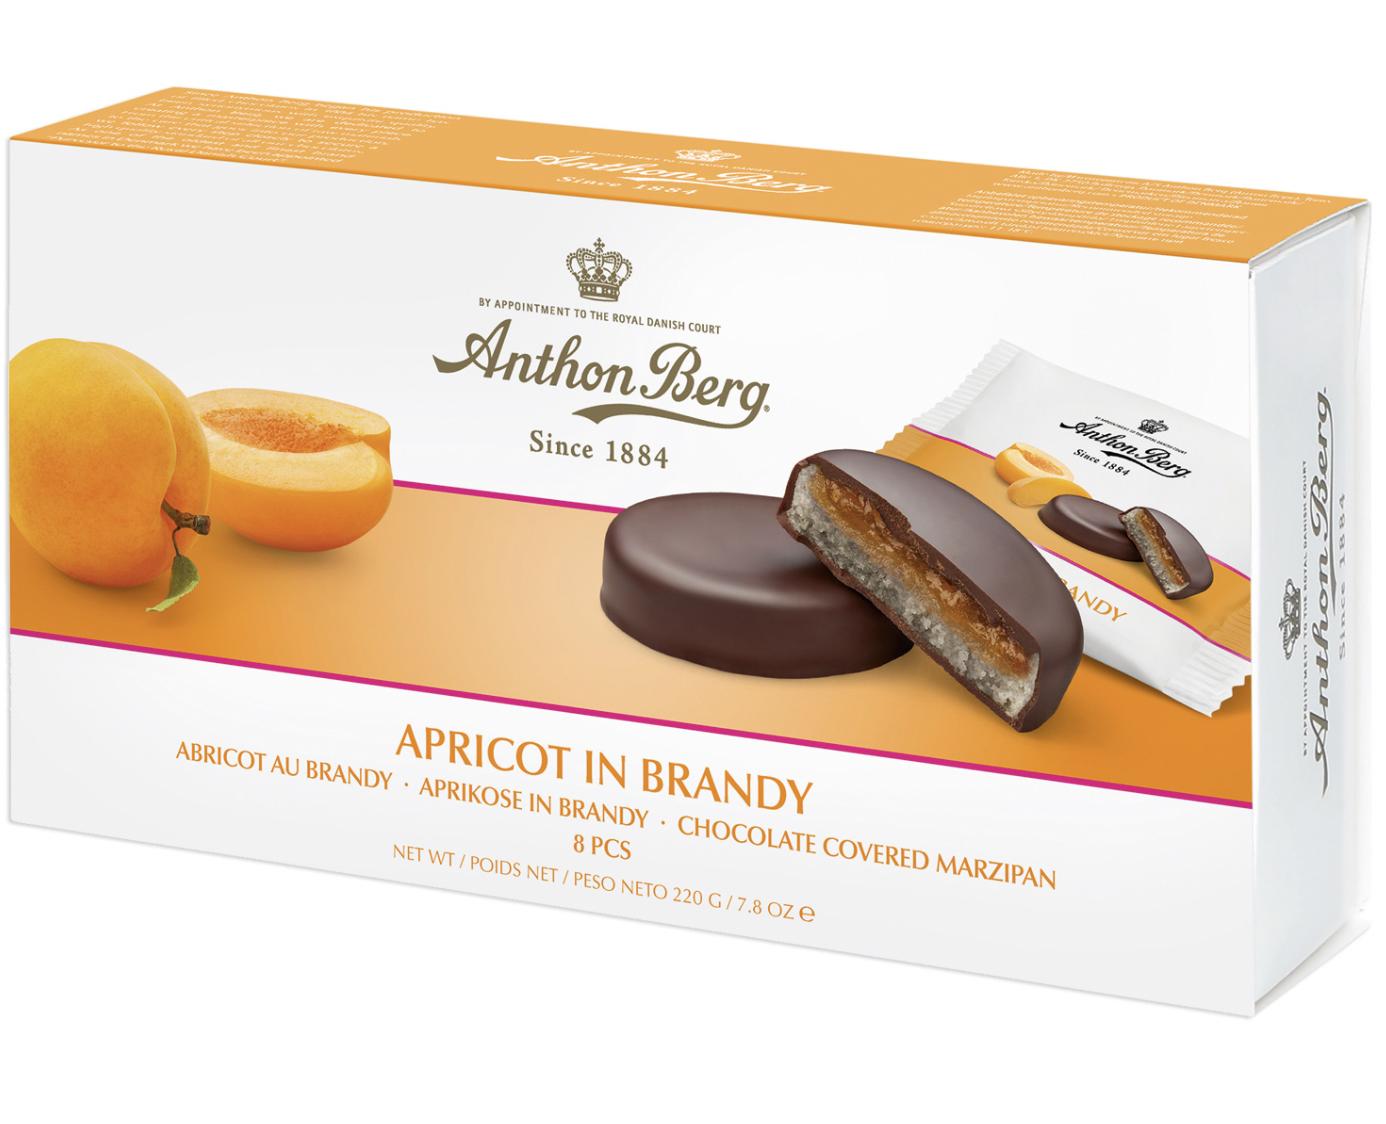 Anthon Berg Apricot in Brandy 220g